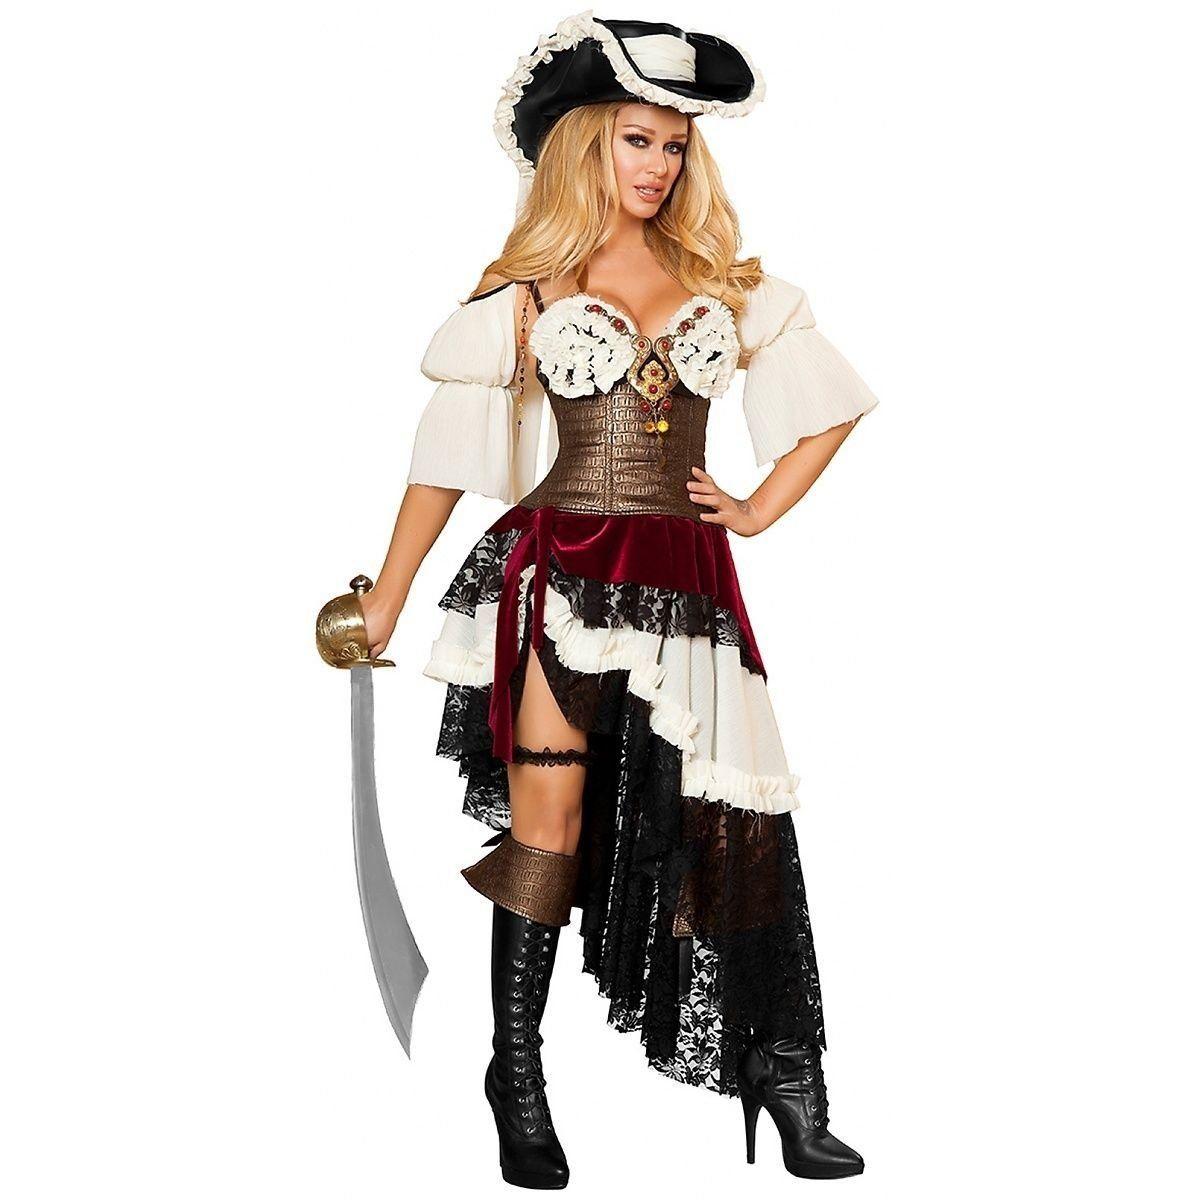 Sexy Pirateer Costume Adult Womens Pirate